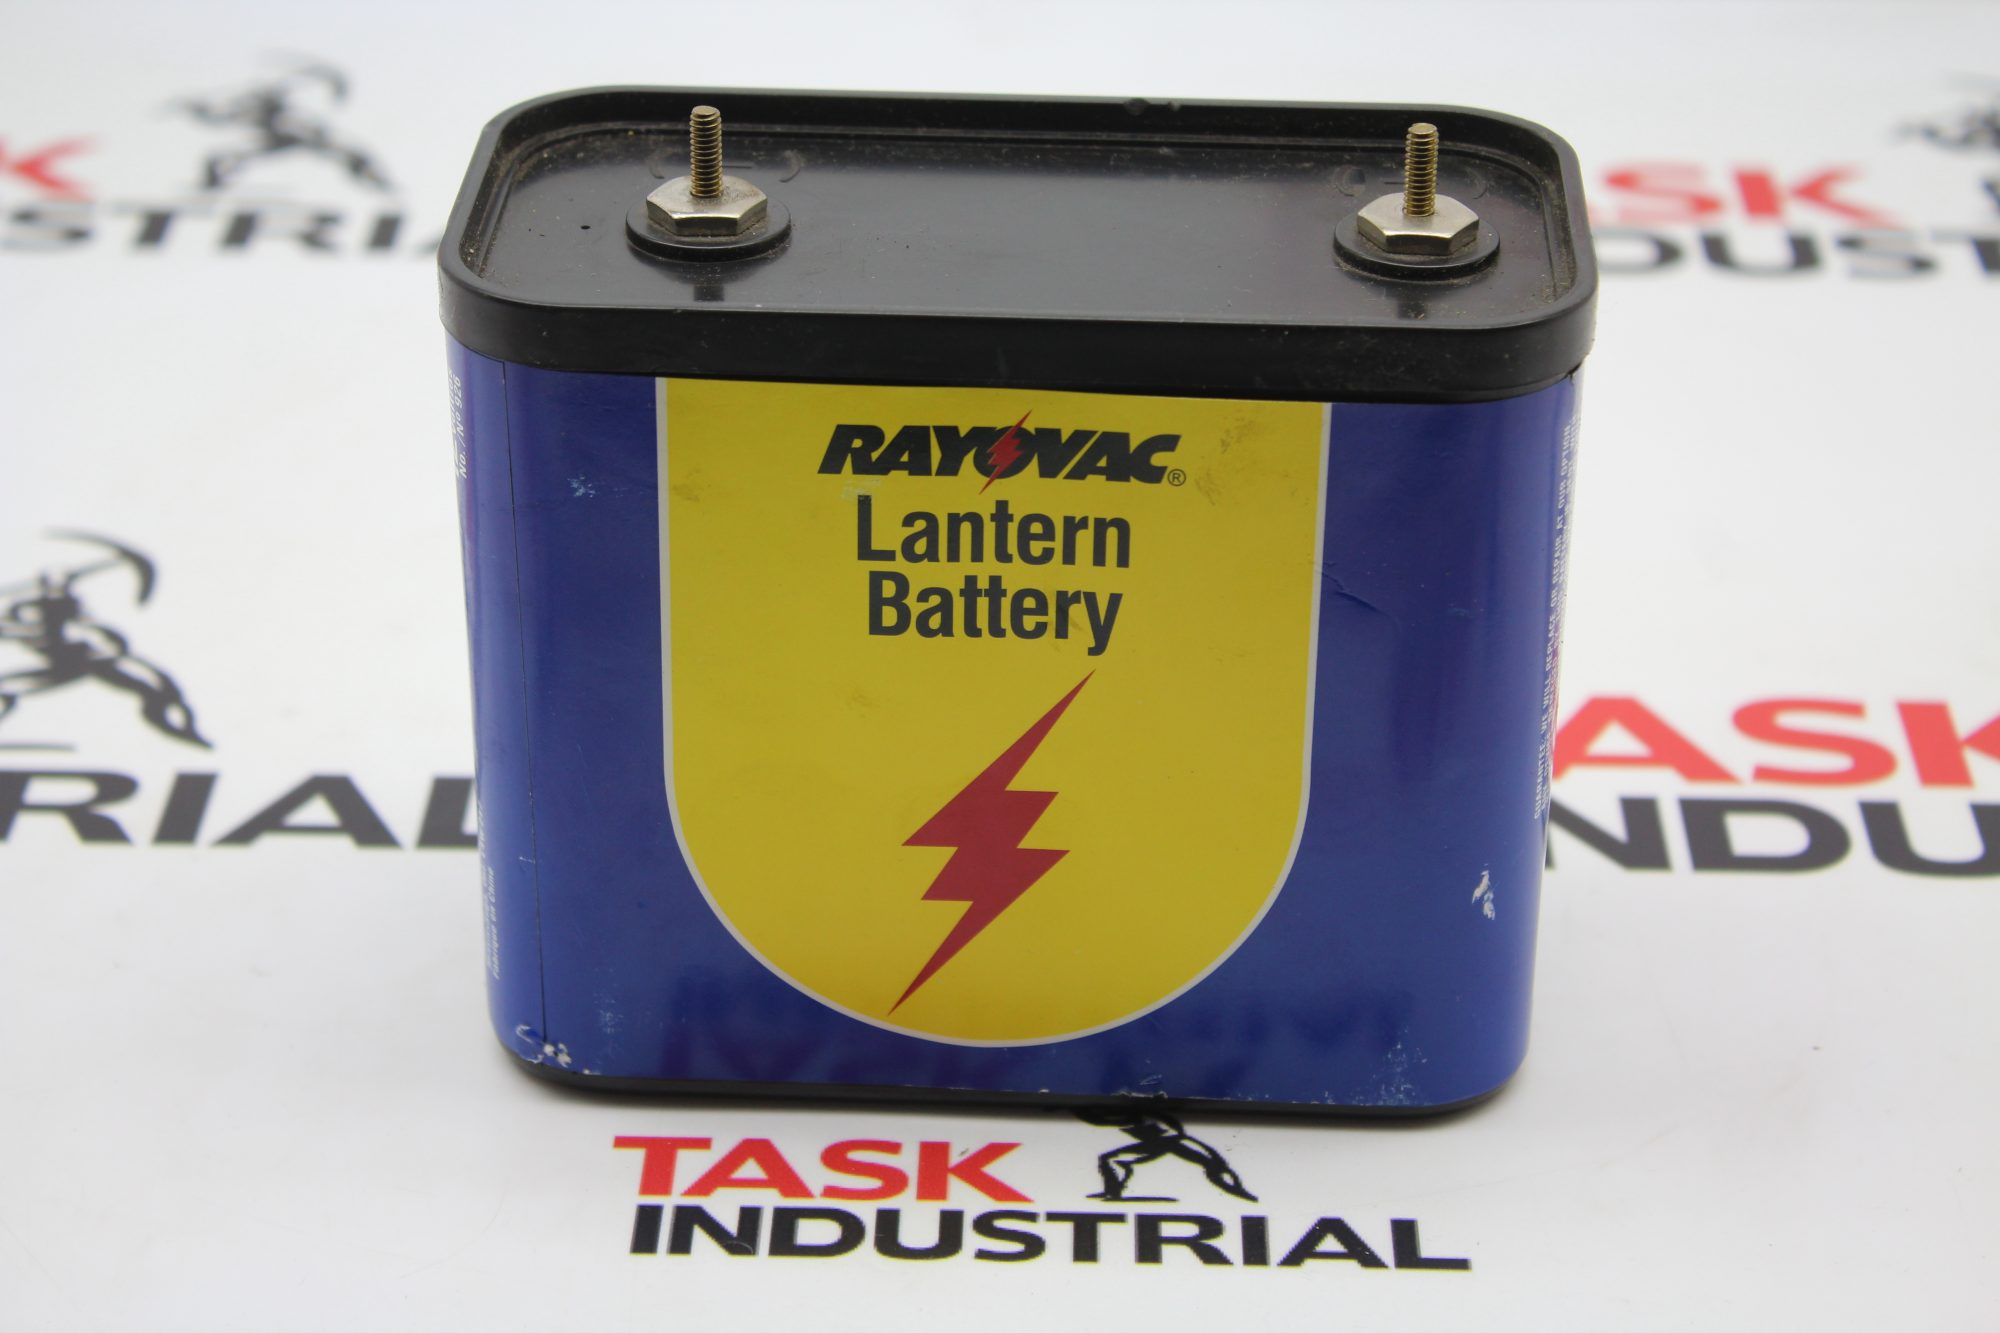 Rayovac Lantern Battery 12Volt No. 926